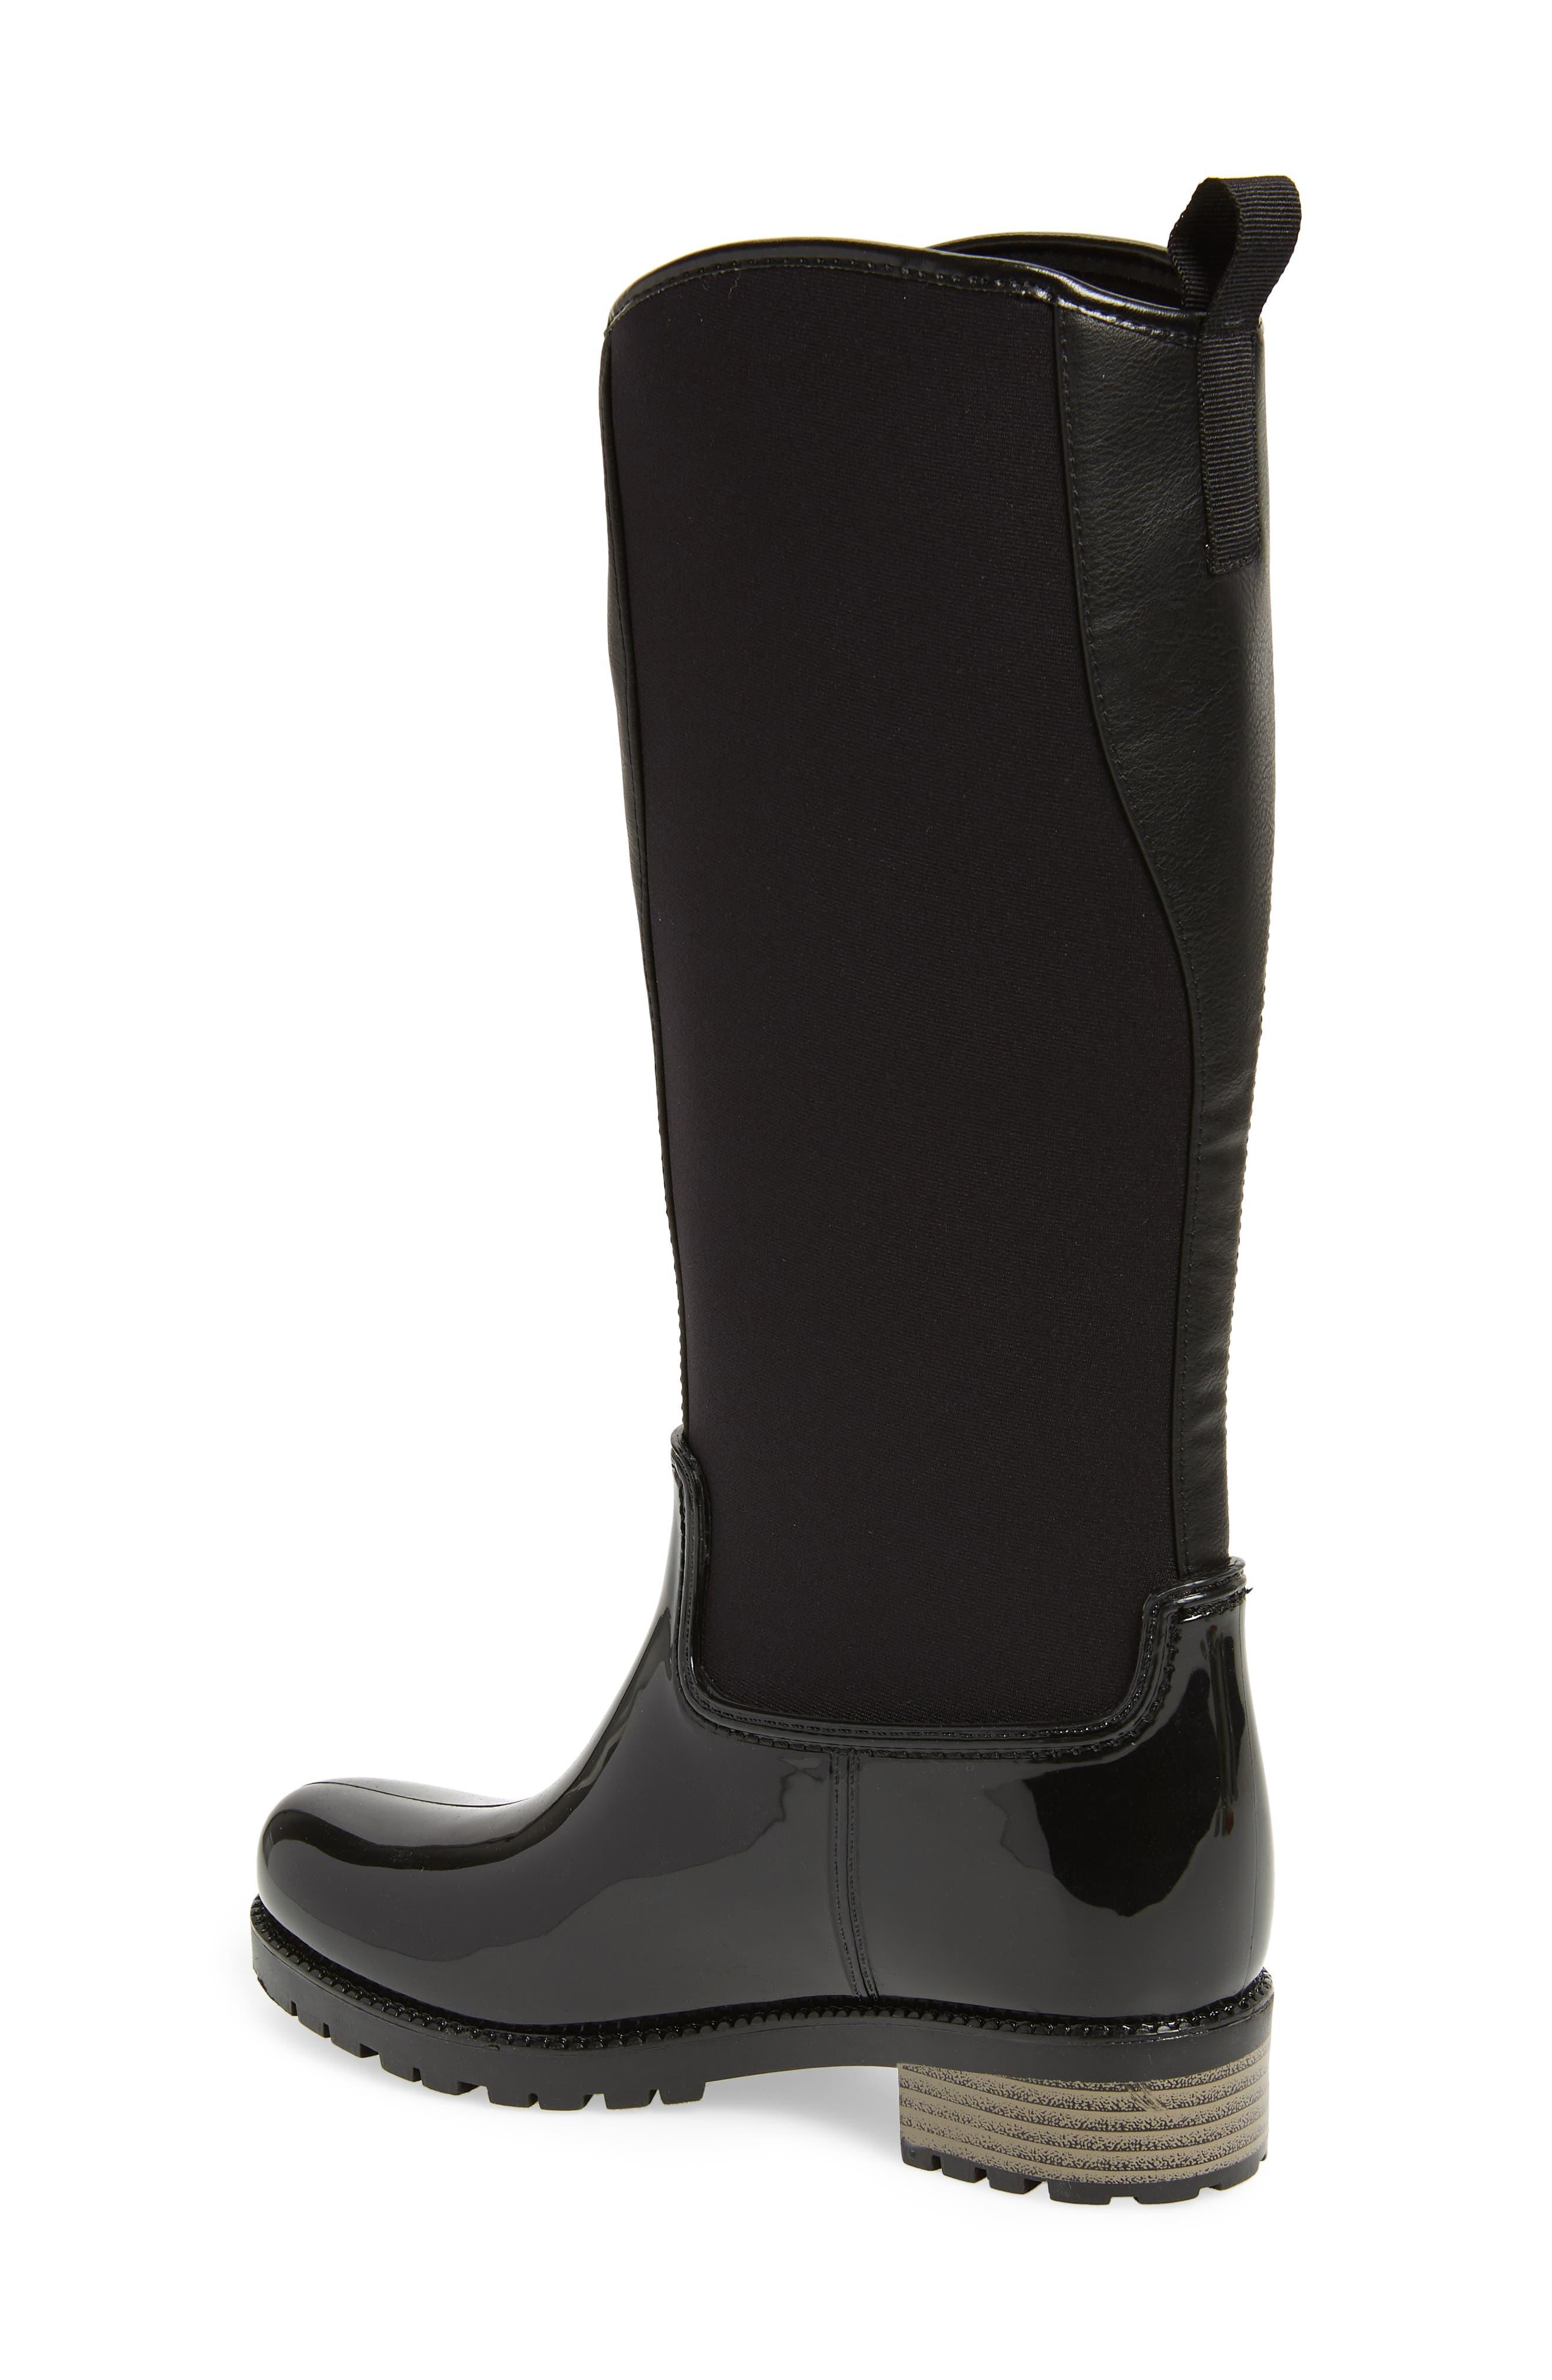 Parma 2 Tall Waterproof Rain Boot,                             Alternate thumbnail 2, color,                             BLACK FABRIC